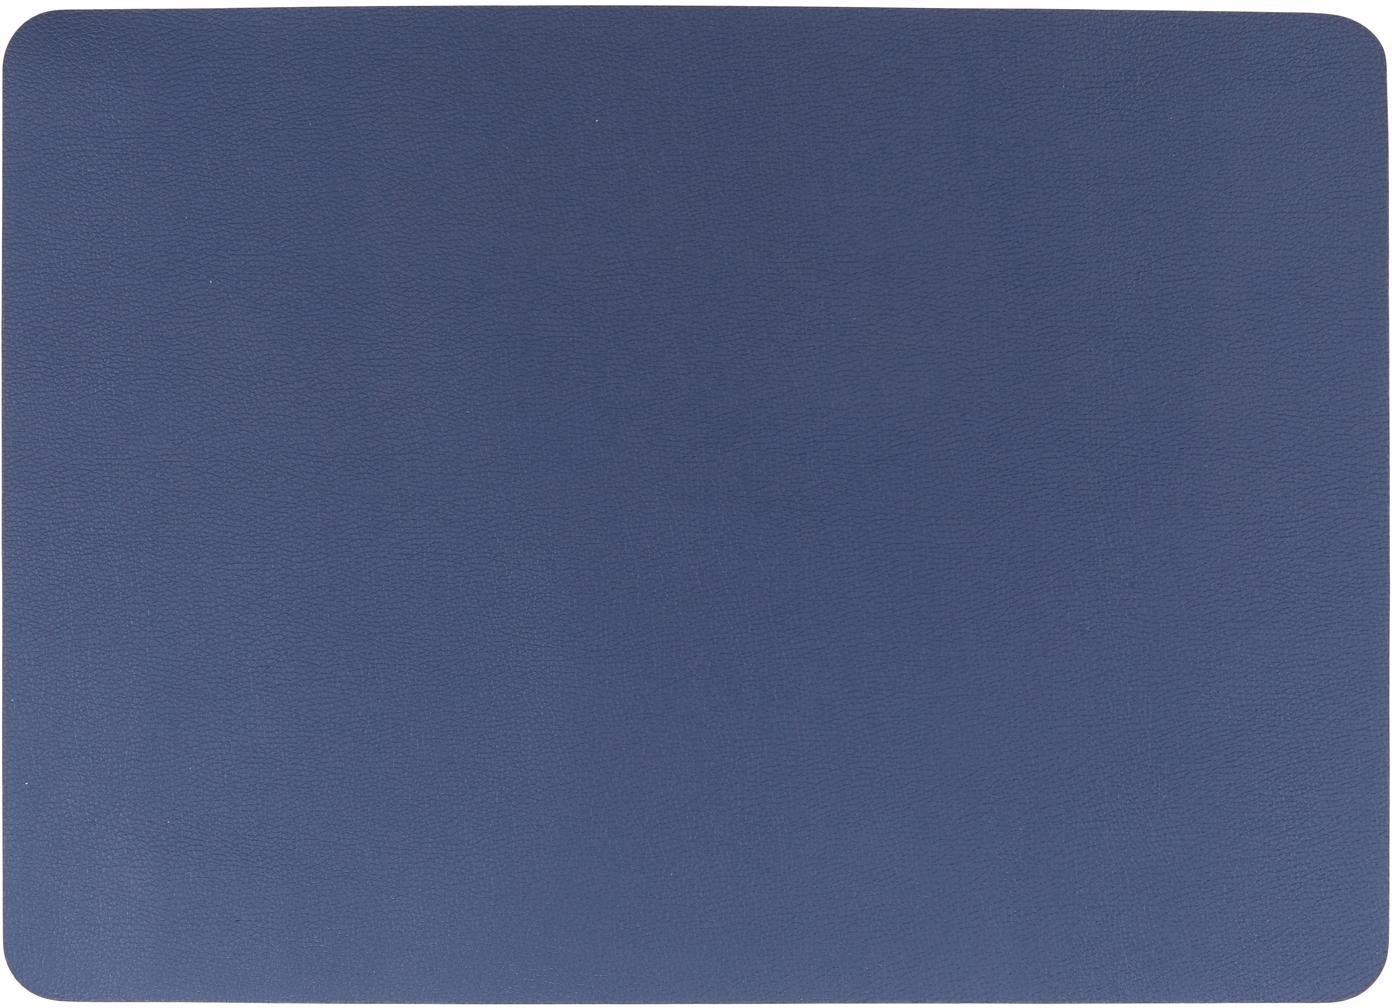 Manteles individuales de cuero sintético Pik, 2uds., Cuero sintético (PVC), Azul marino, An 33 x L 46 cm